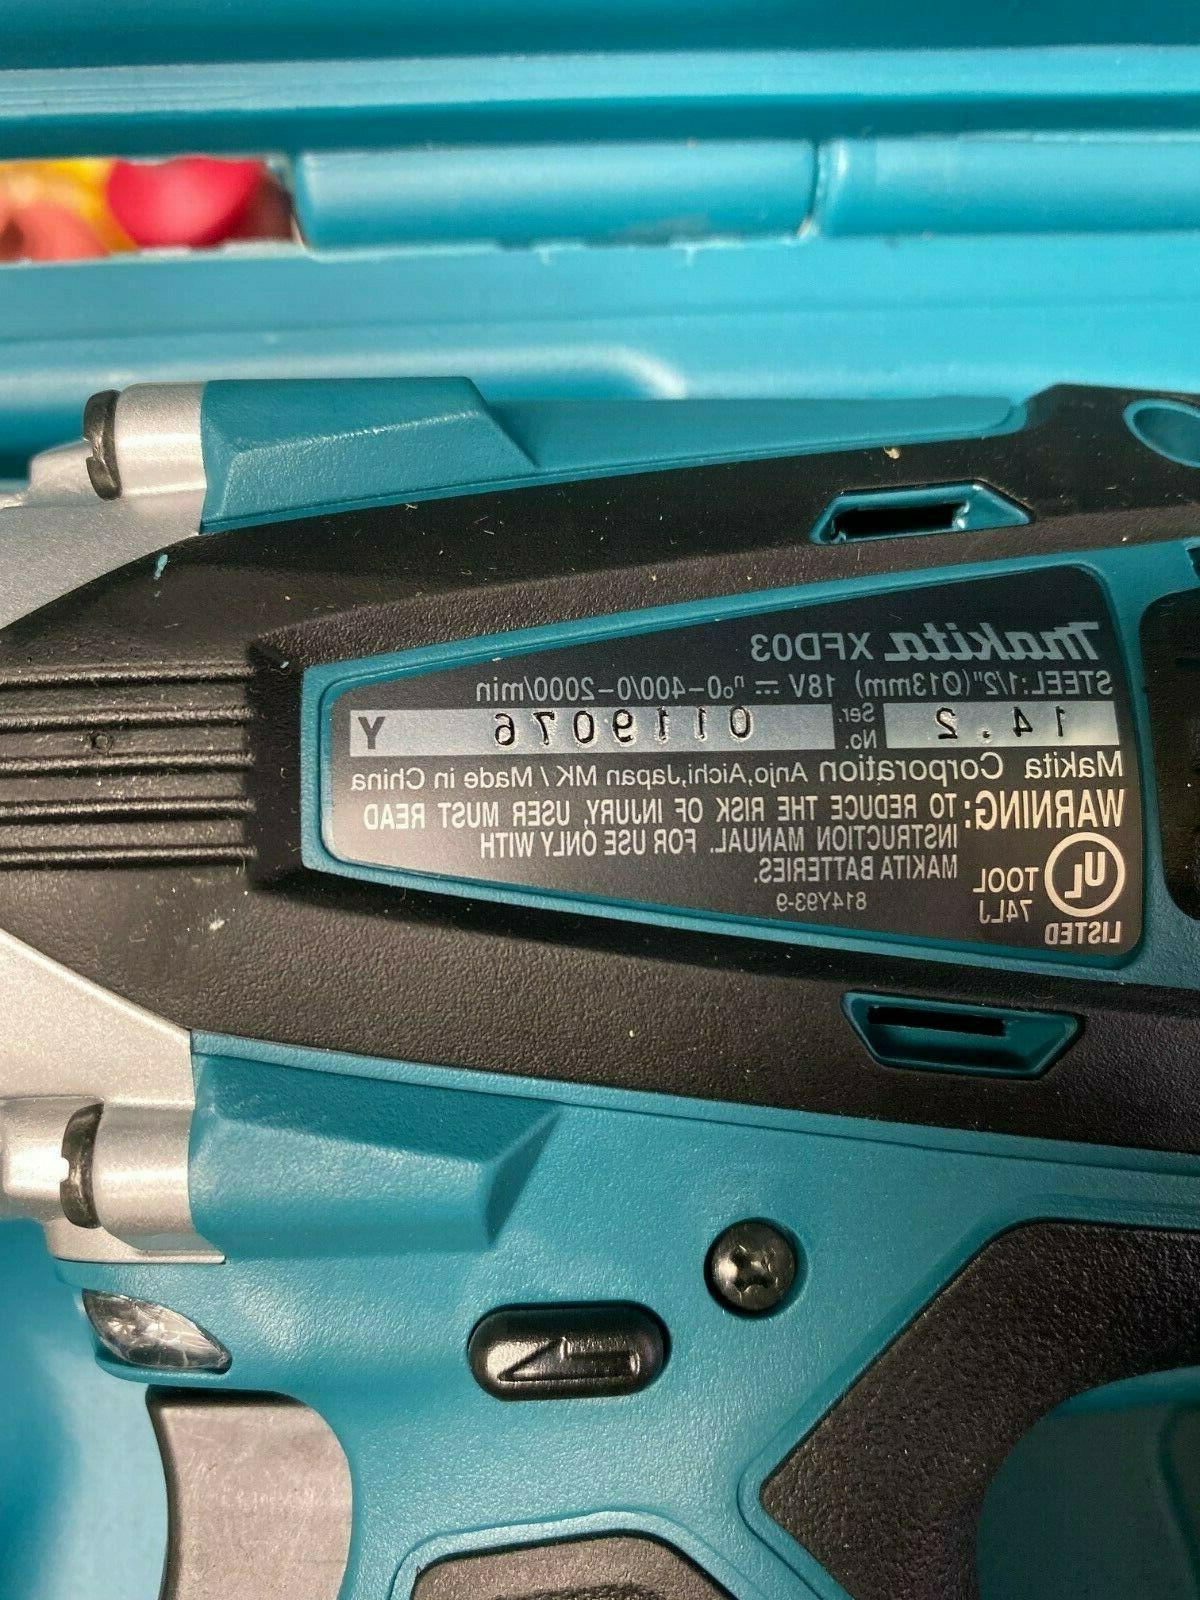 Makita 18-Volt 1/2 in. Cordless Driver/Drill